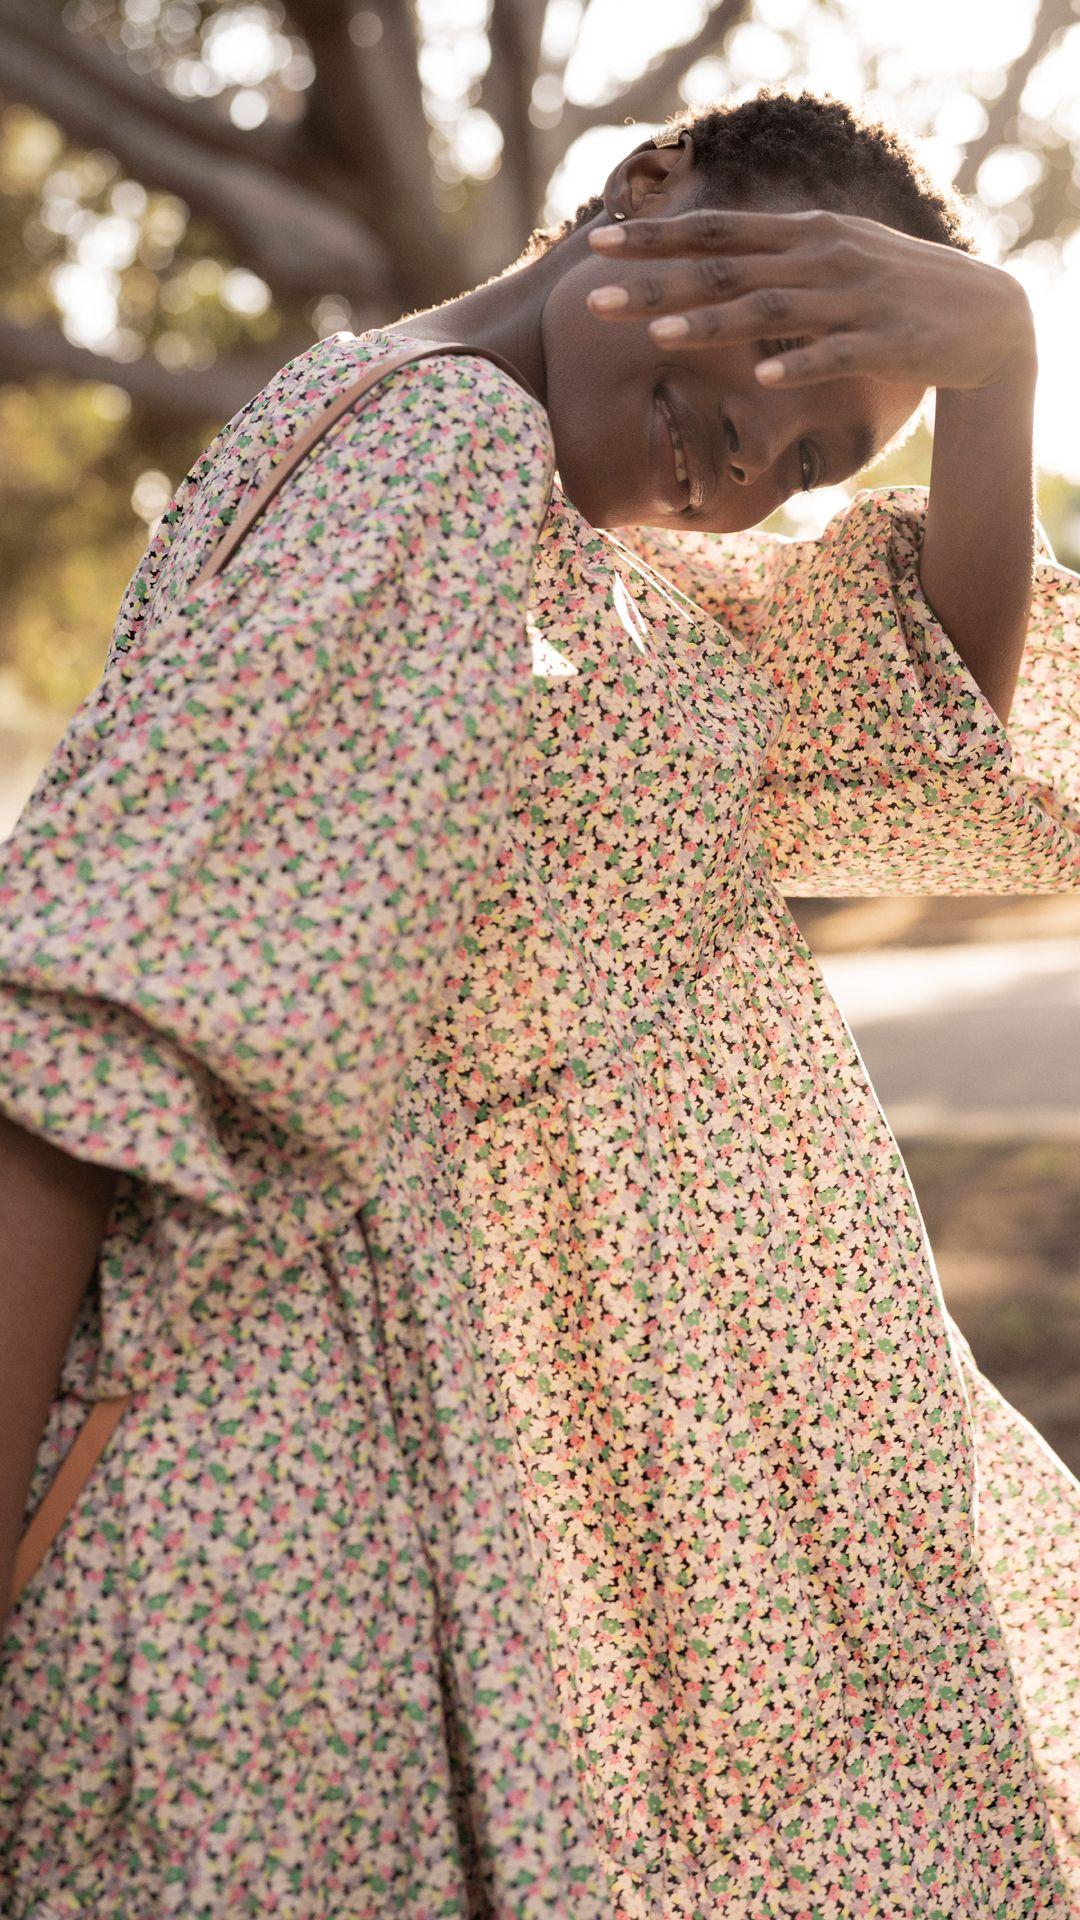 H M Summer Fashion Spring Summer Fashion Casual Summer Dresses [ 1920 x 1080 Pixel ]